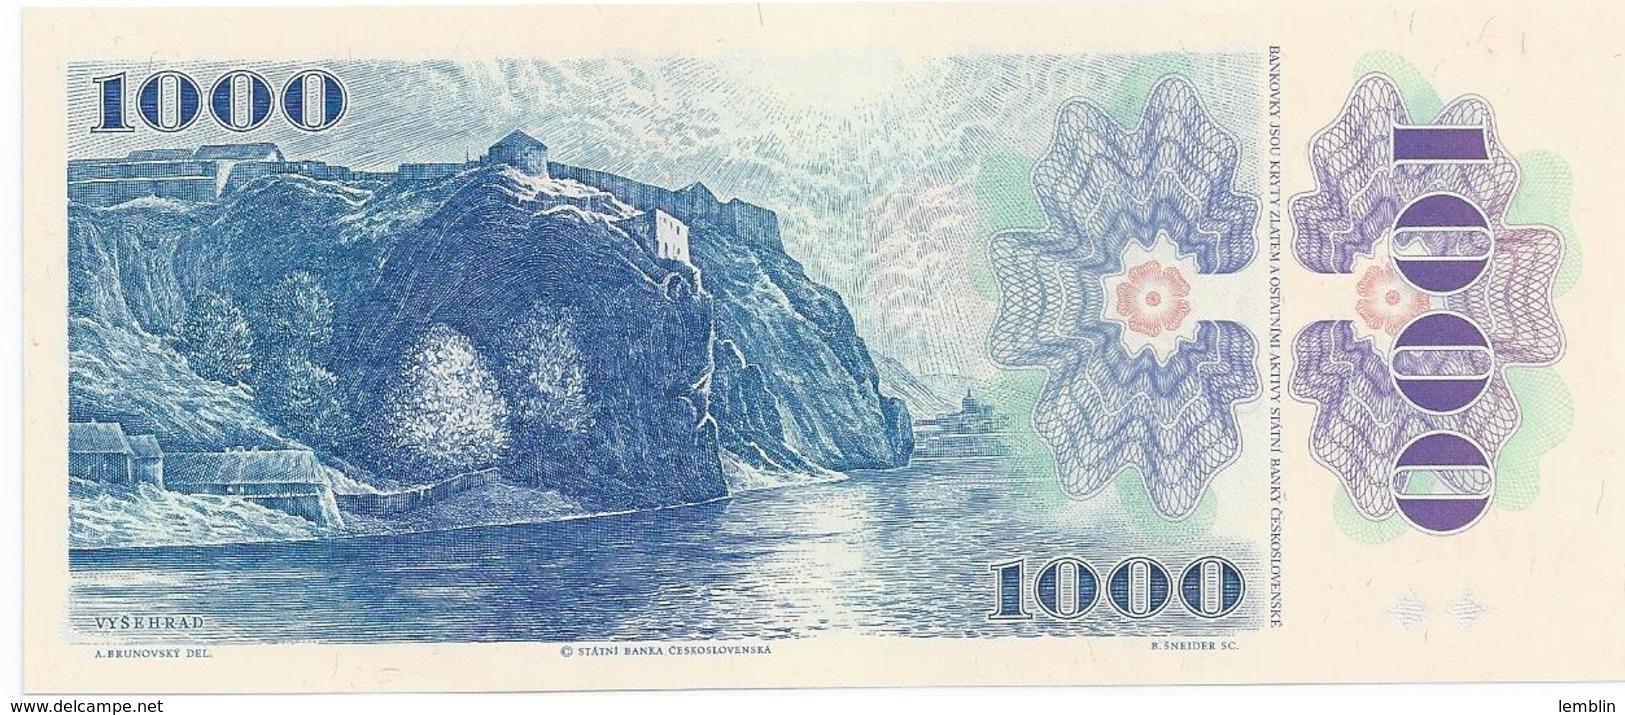 1.000 COURONNES 1985 - Czechoslovakia